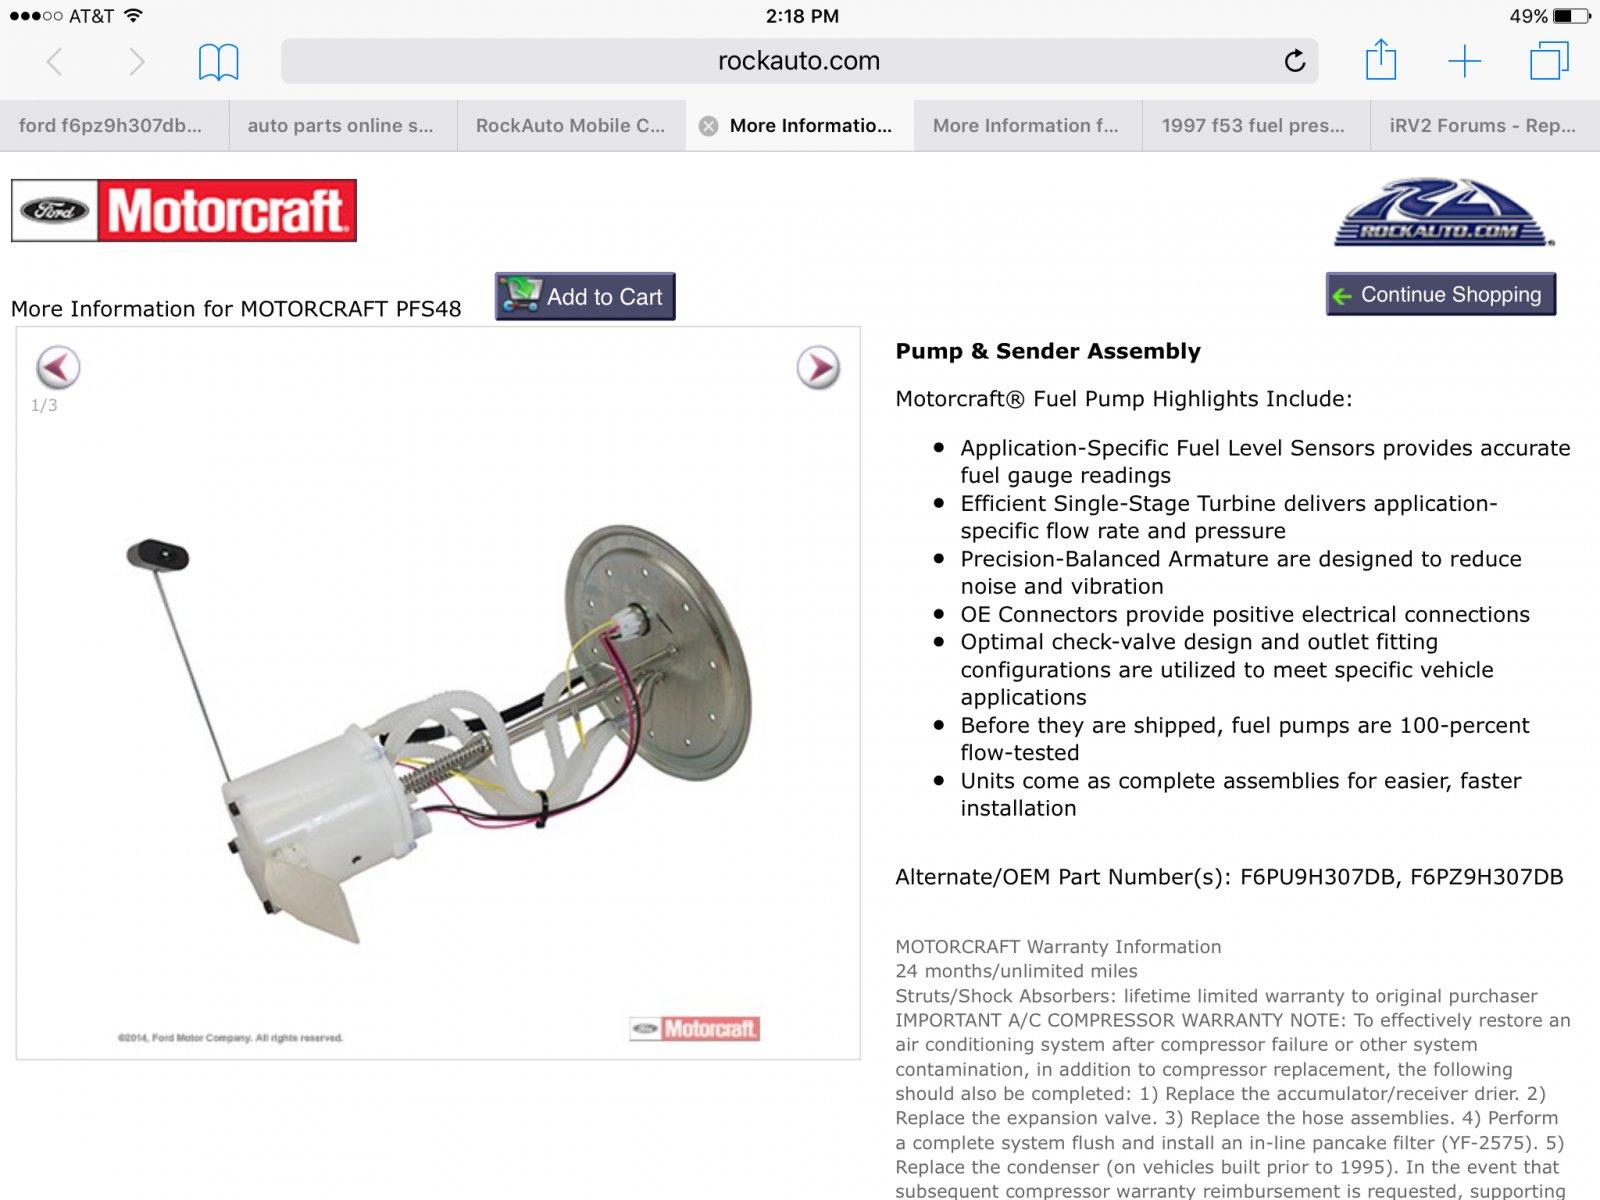 Peugeot 307 Rear Light Wiring Diagram : Need mini cooper fuse box diagram peugeot location php